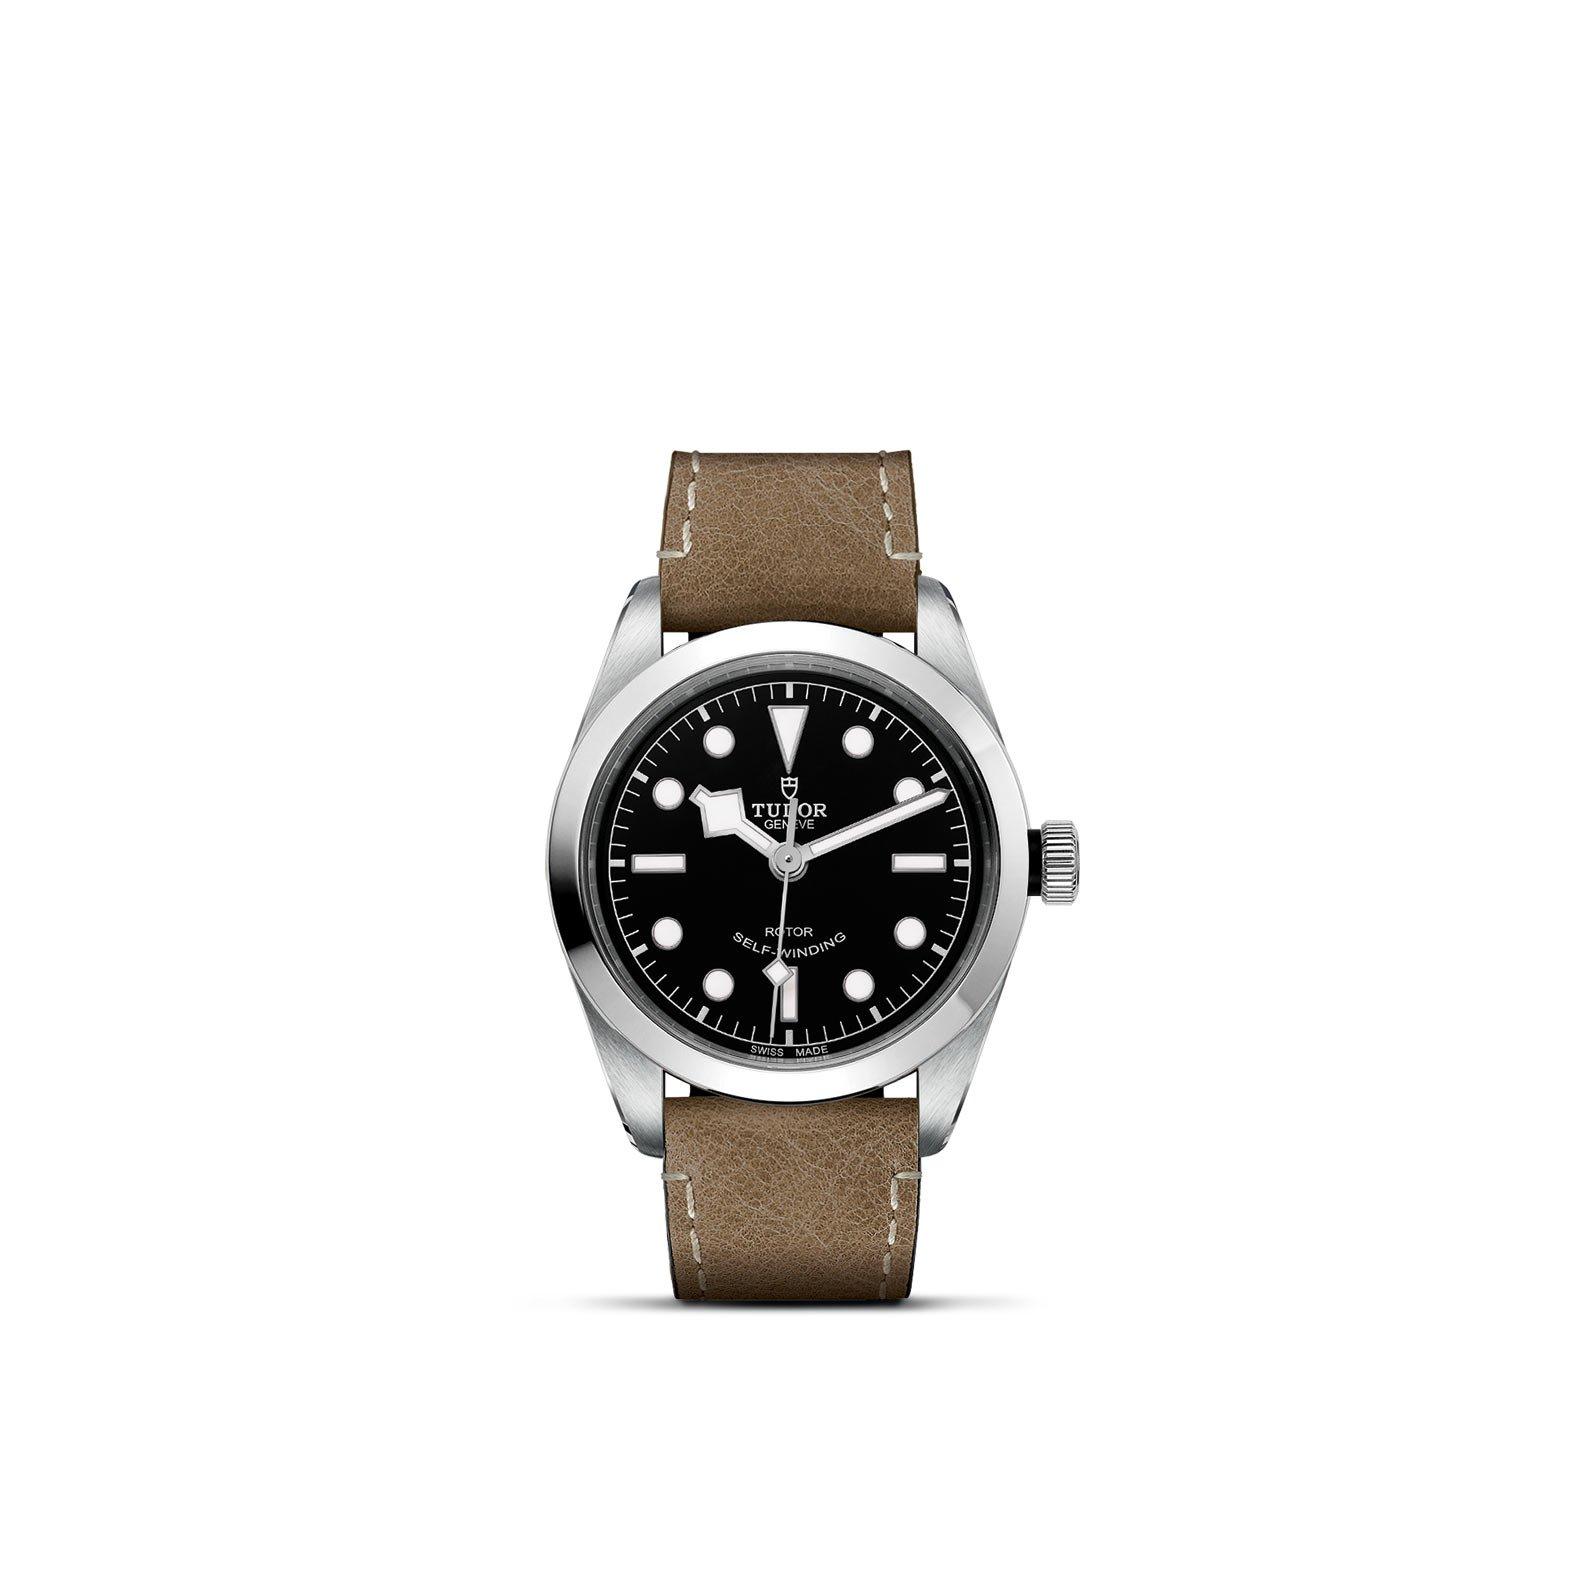 Montre TUDOR Black Bay 36 boîtier en acier, 36mm, bracelet en cuir beige vue 1